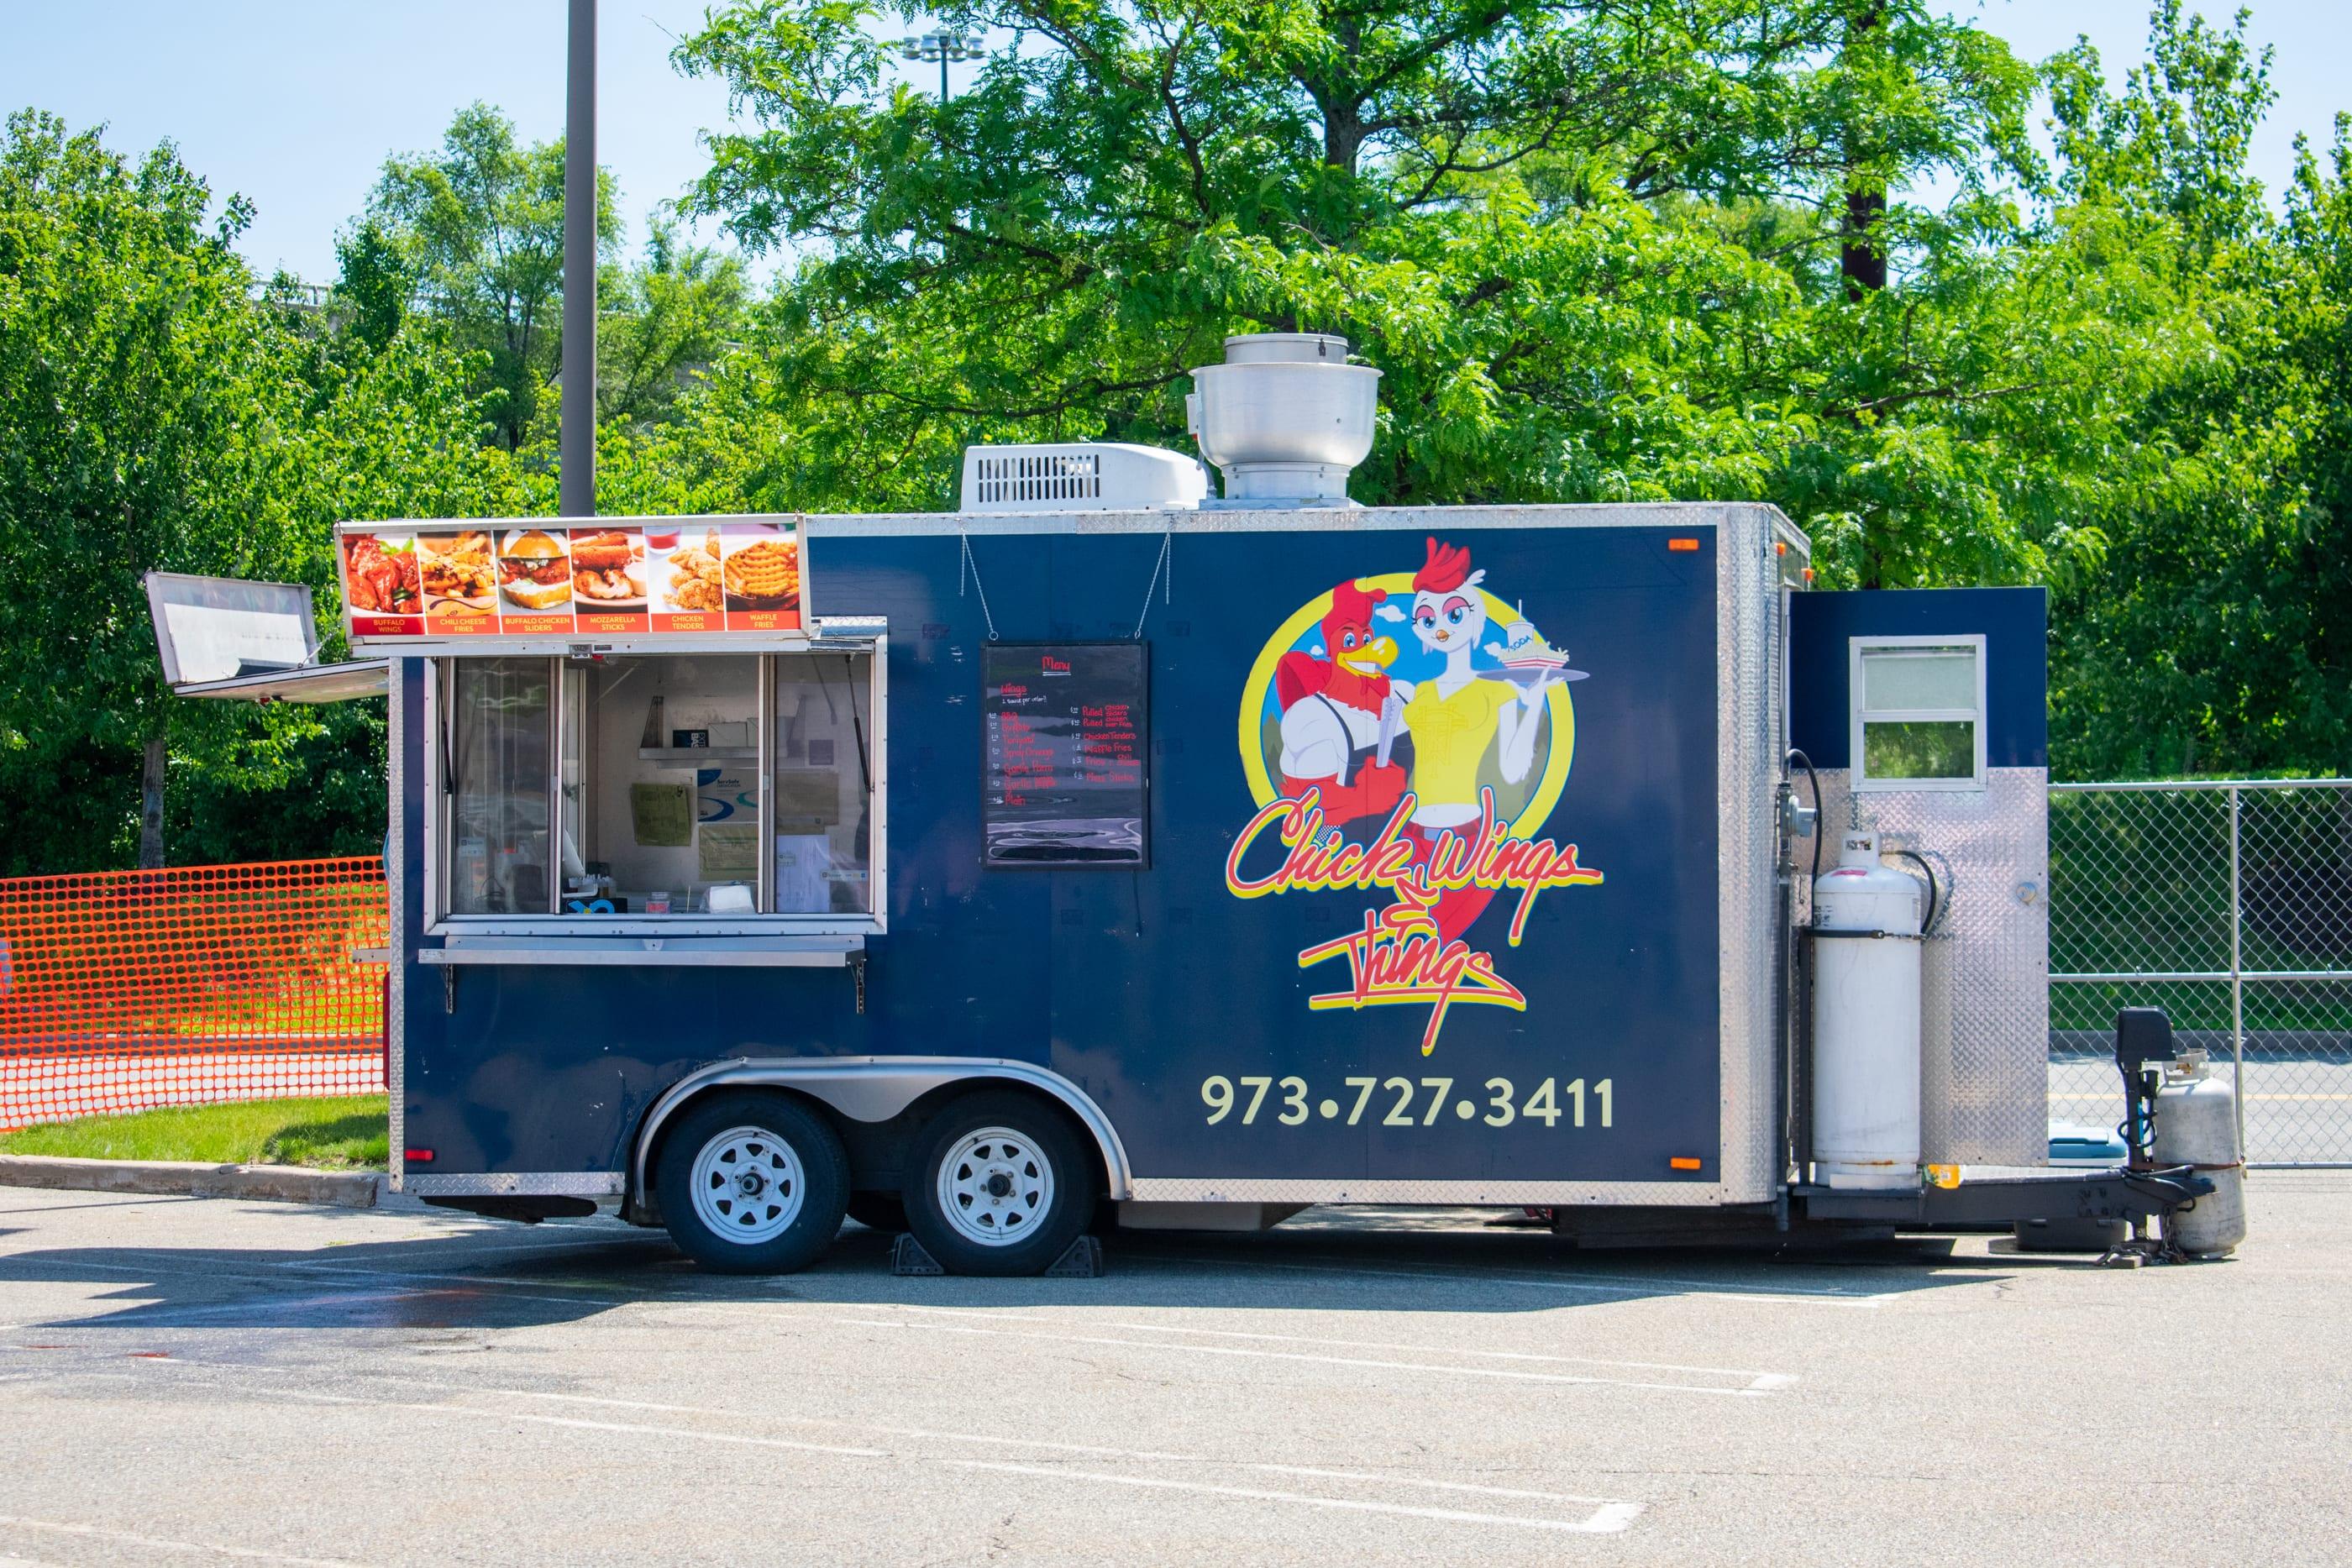 Chick Wings & Things Food Truck